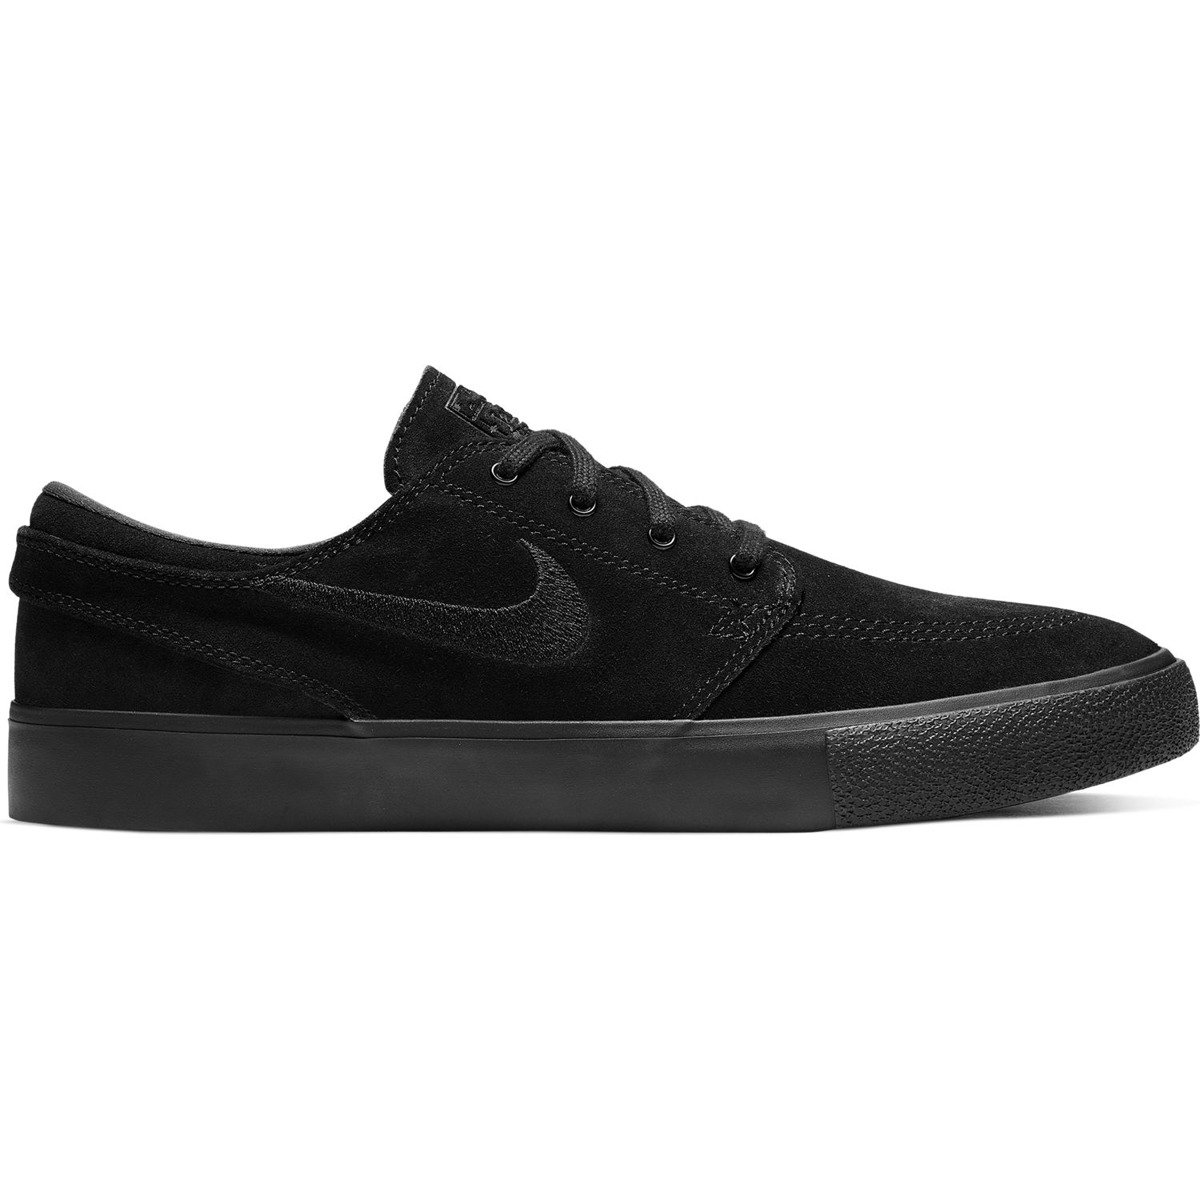 Nike SB Zoom Stefan Janoski RM AQ7475 004